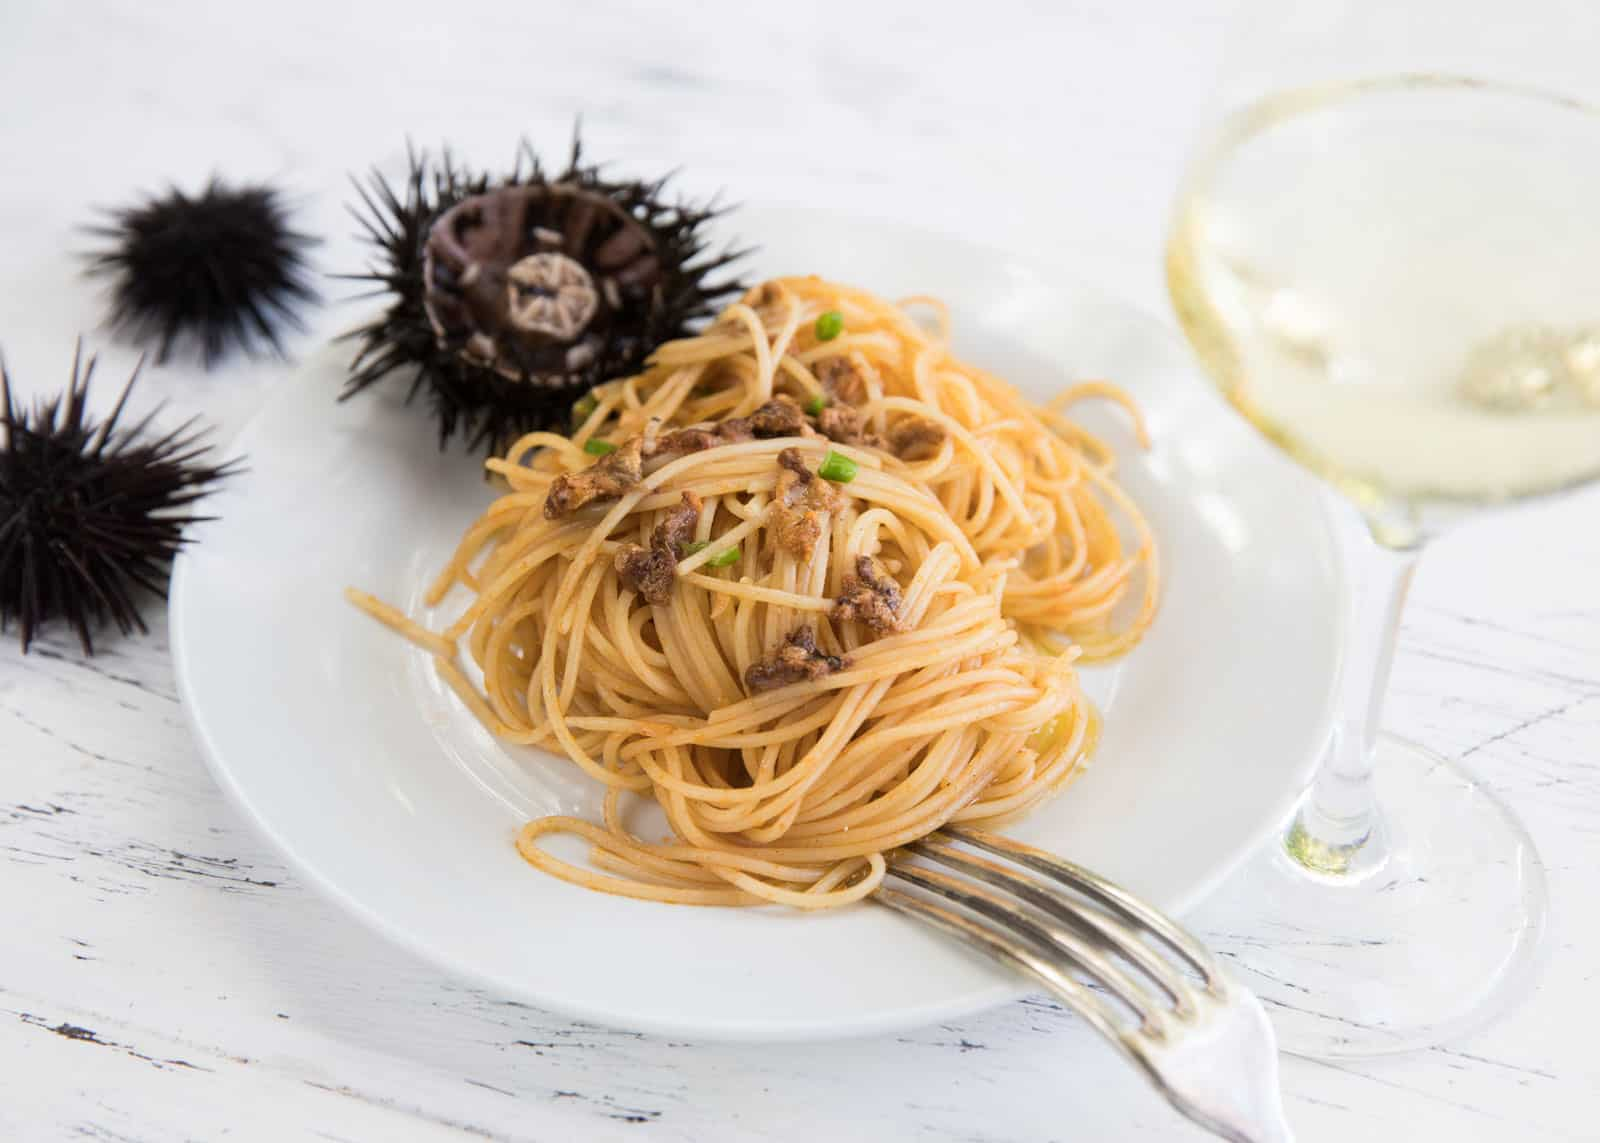 Spaghetti mit Seeigeln